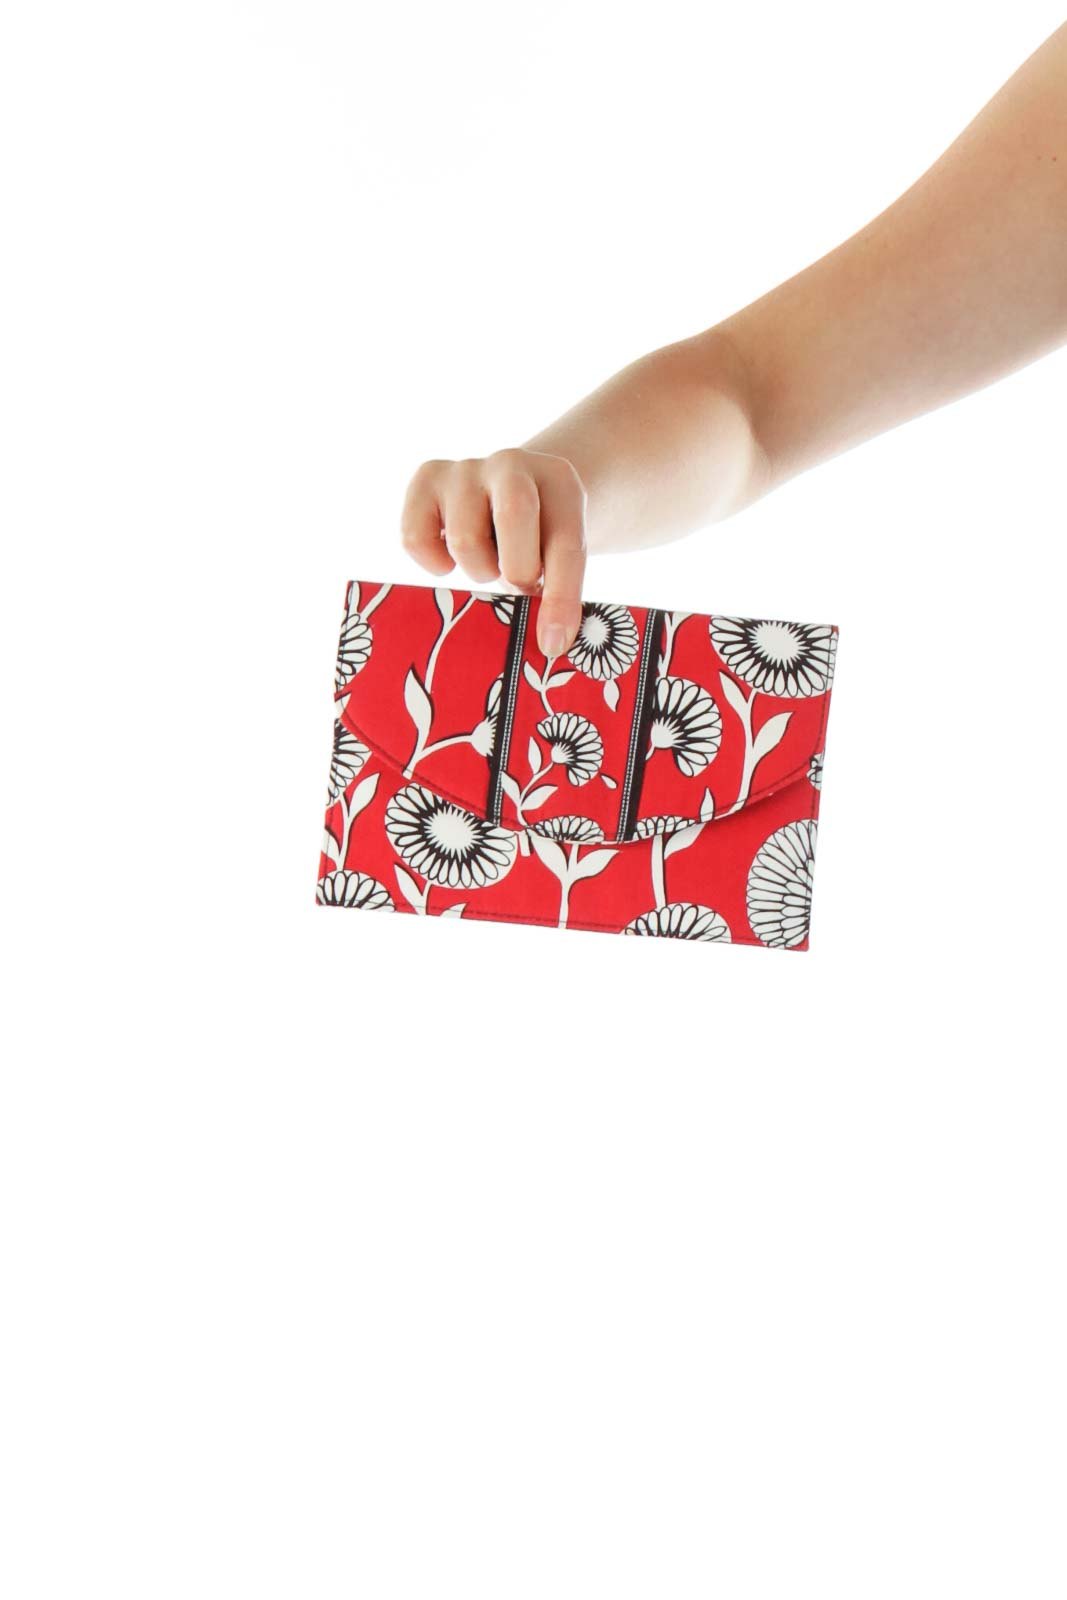 Red White Black Flower Print Clutch